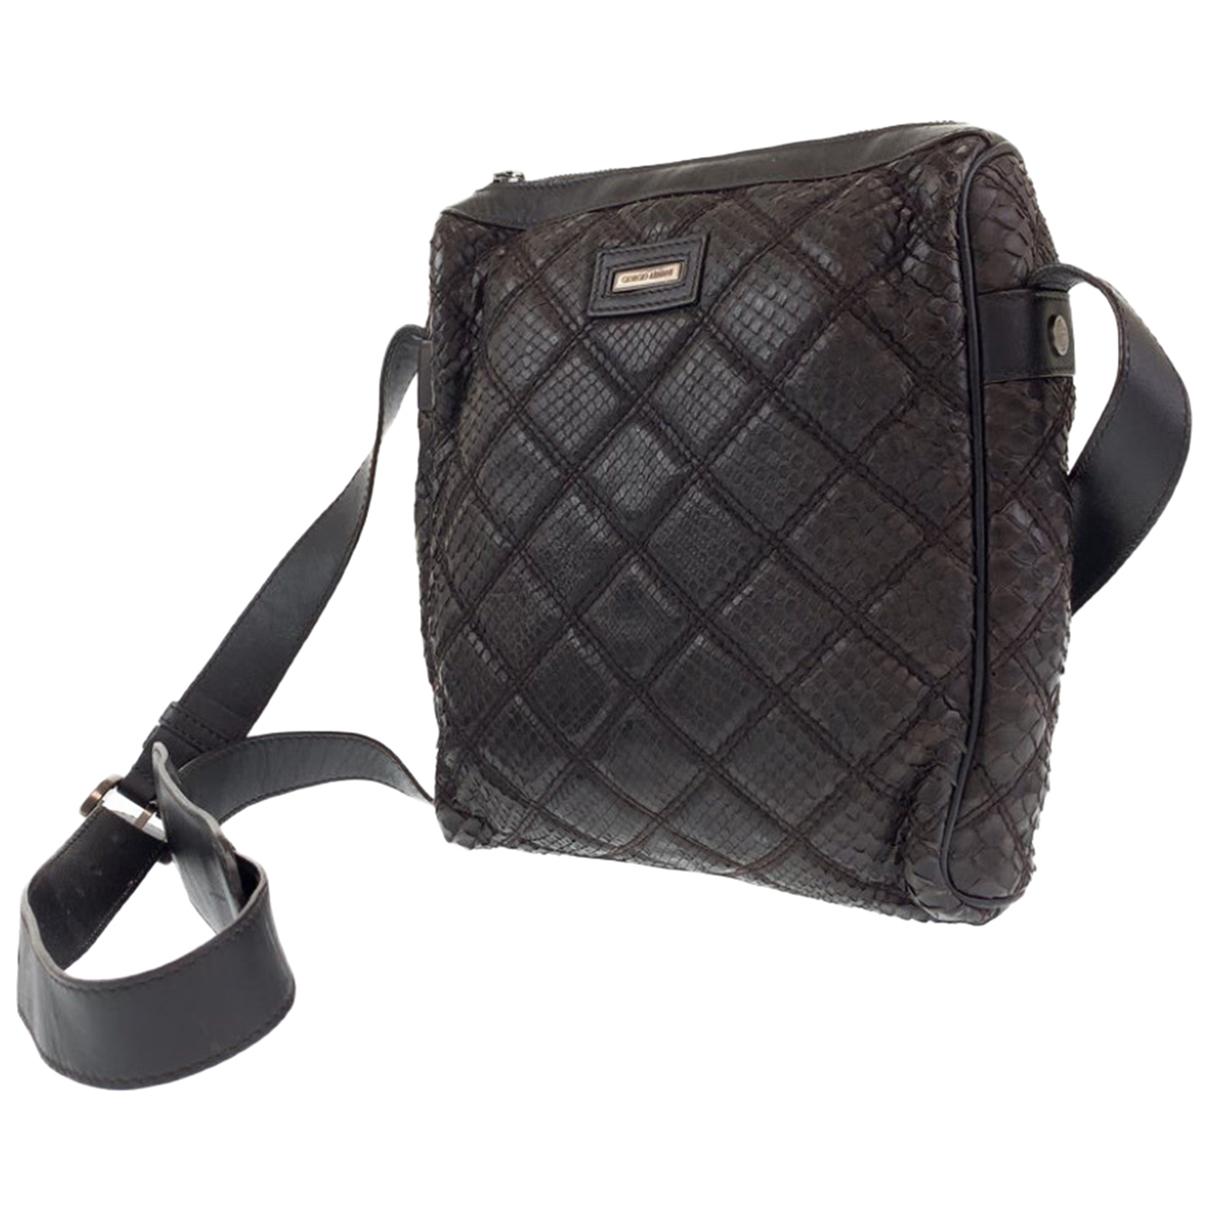 Giorgio Armani N handbag for Women N